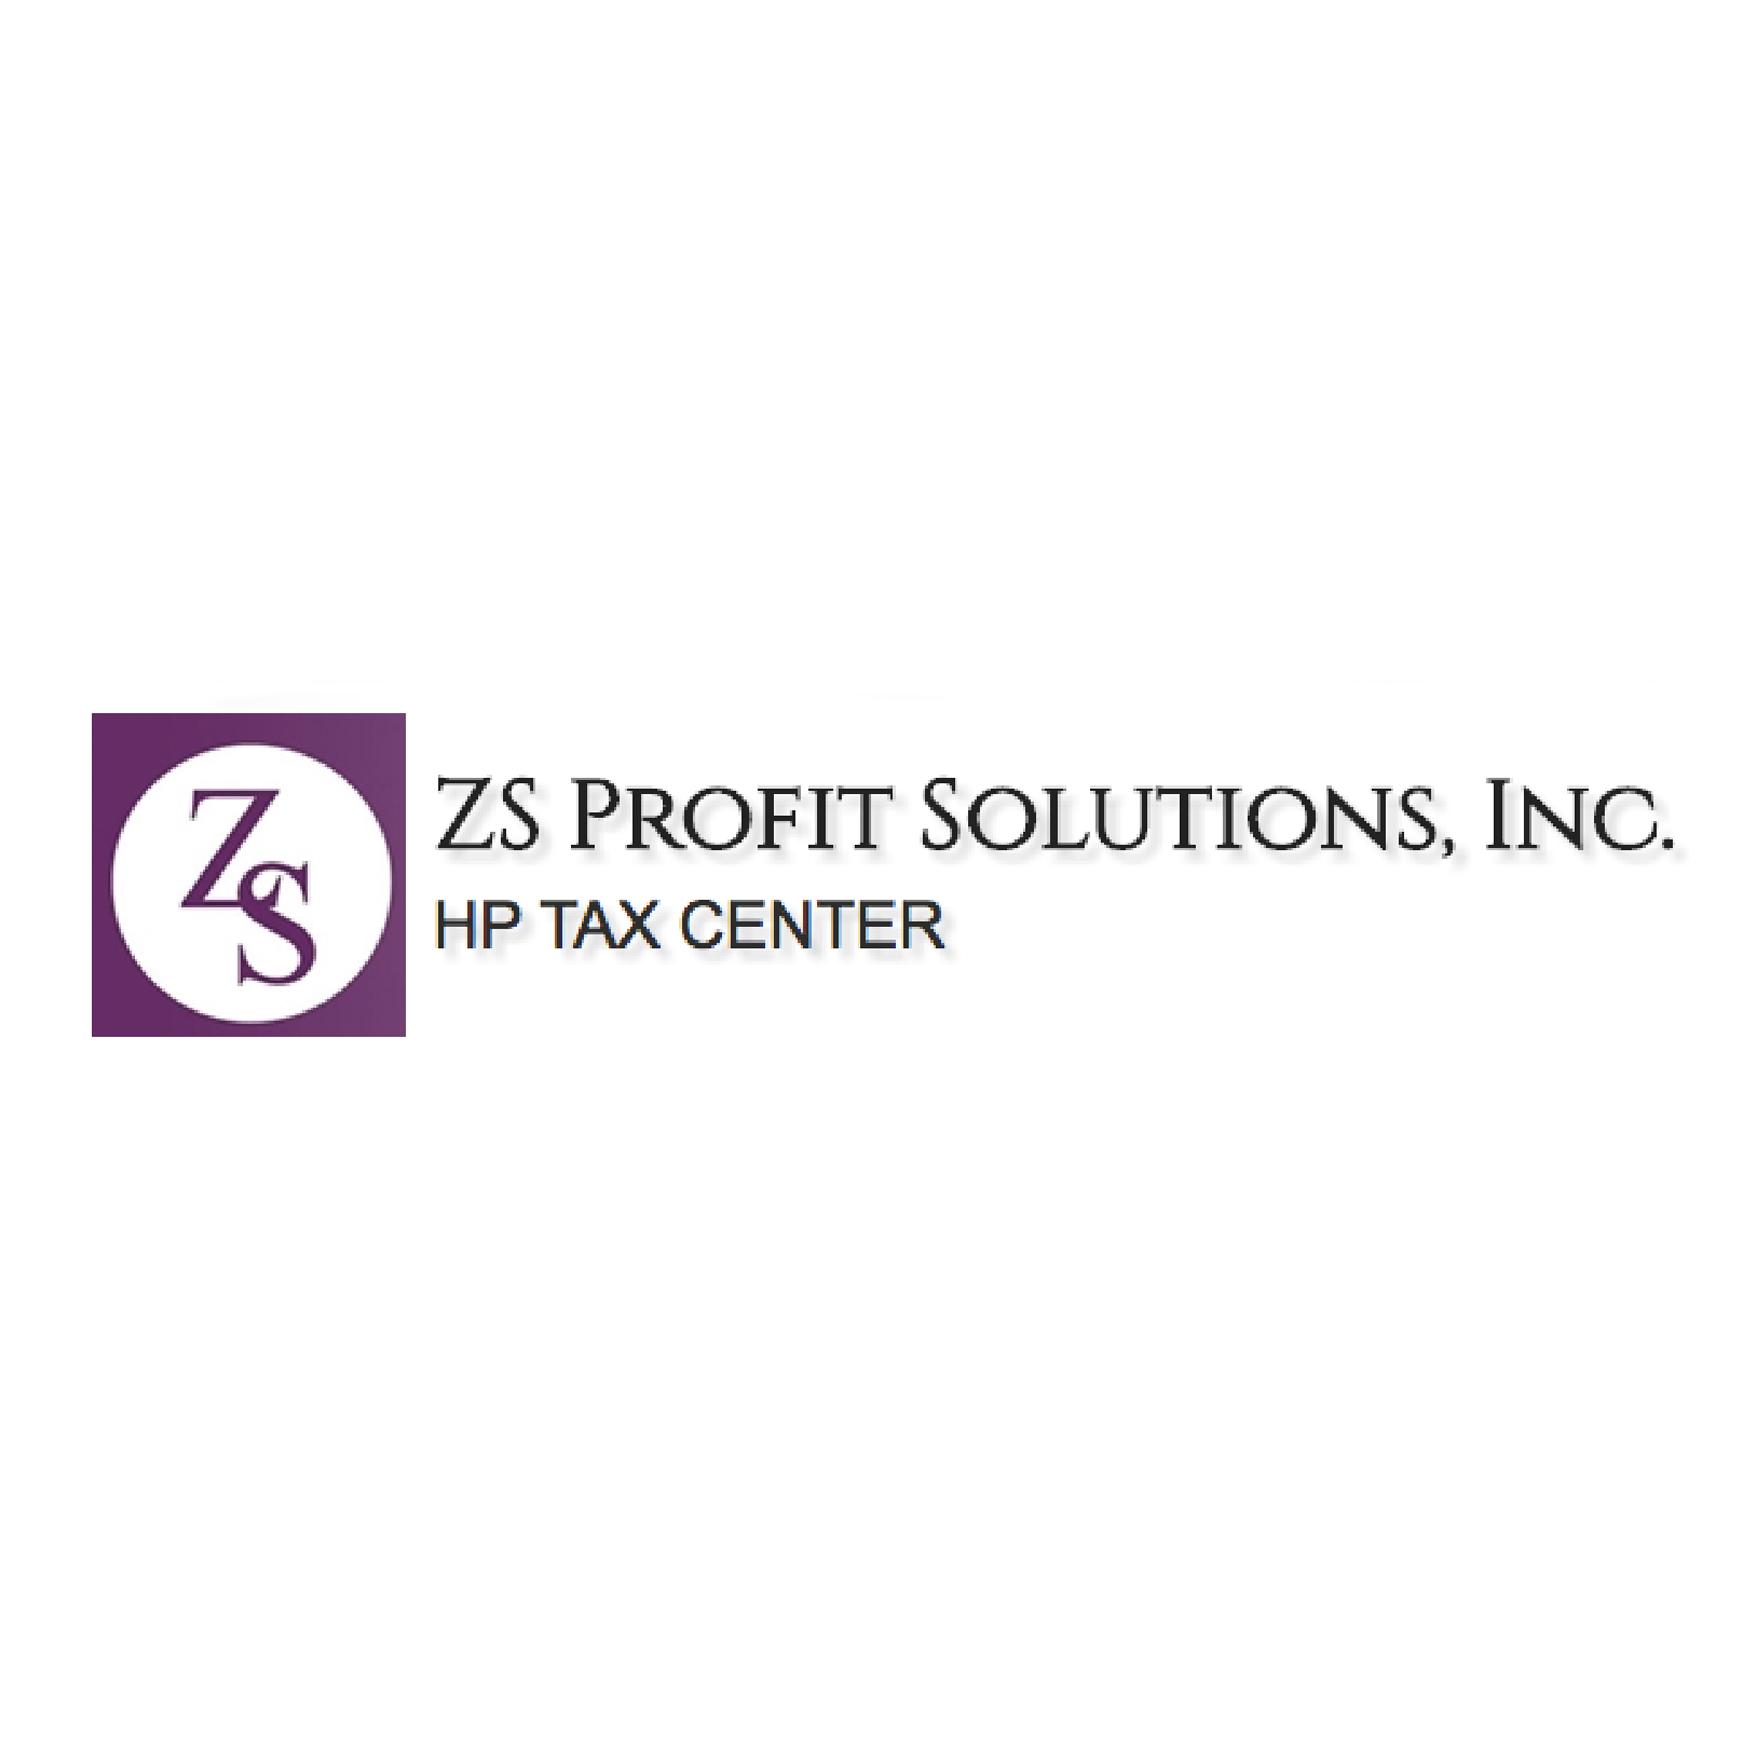 ZS Profit Solutions